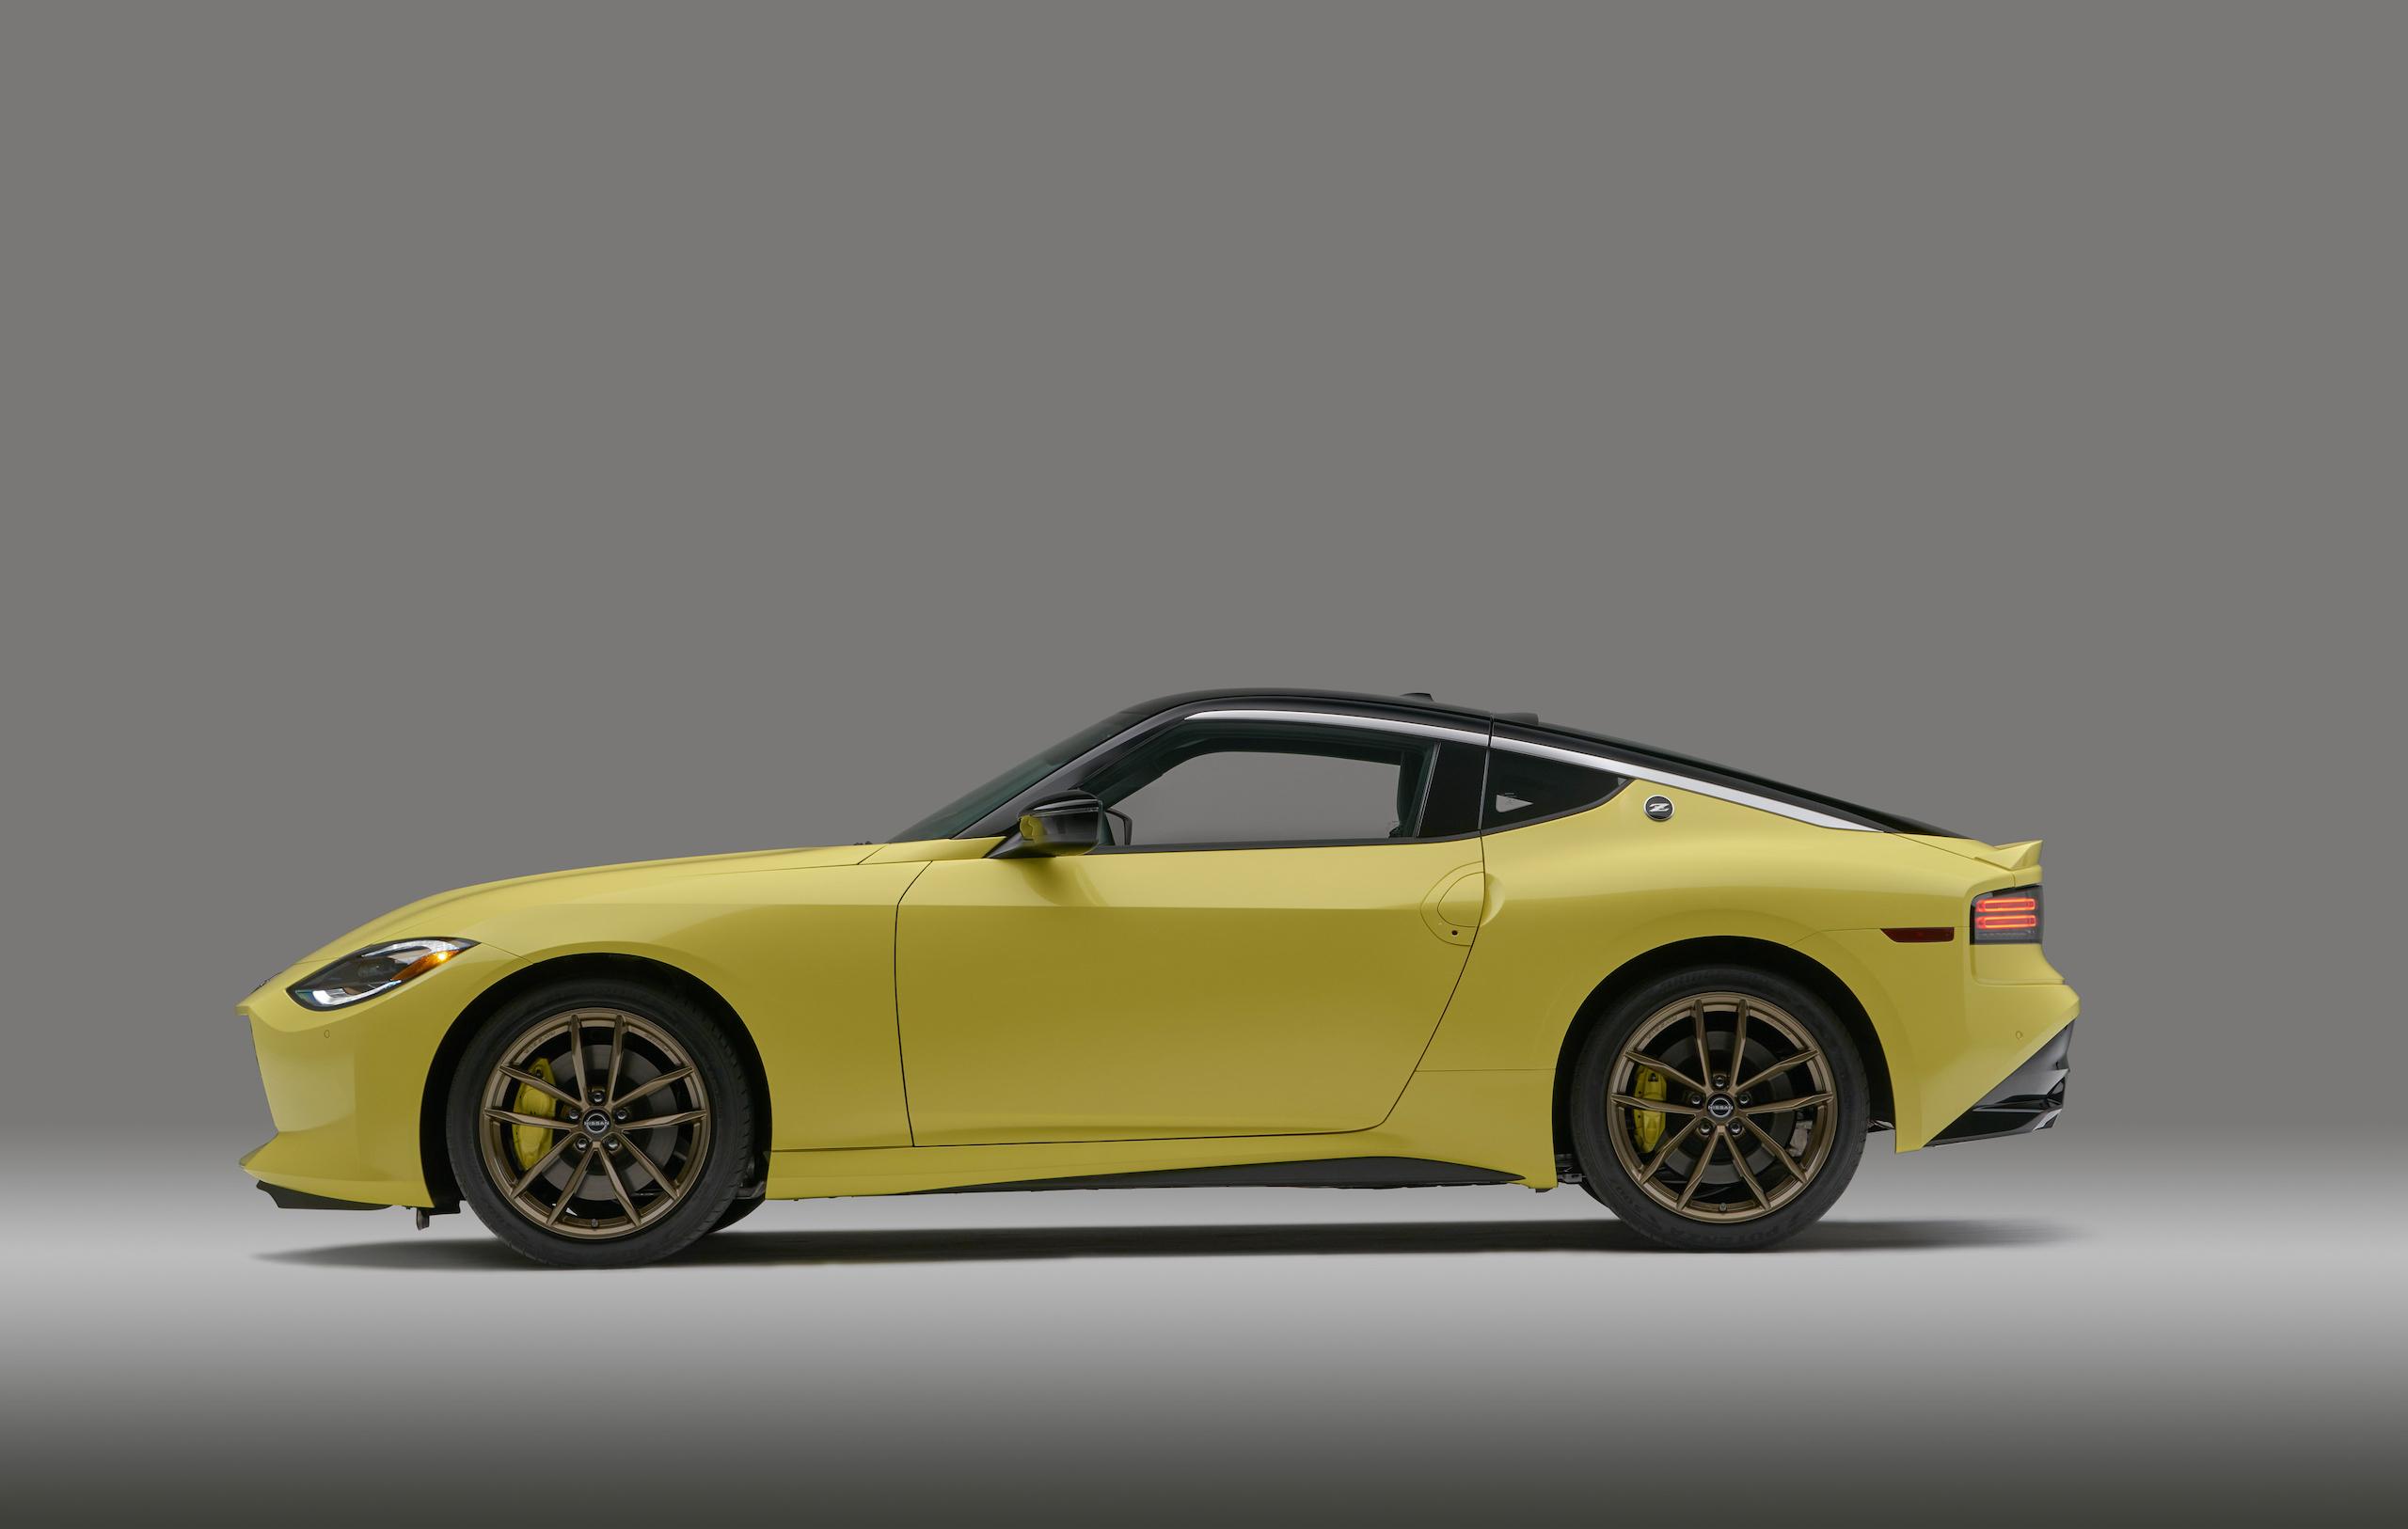 2023 Nissan Z side profile yellow